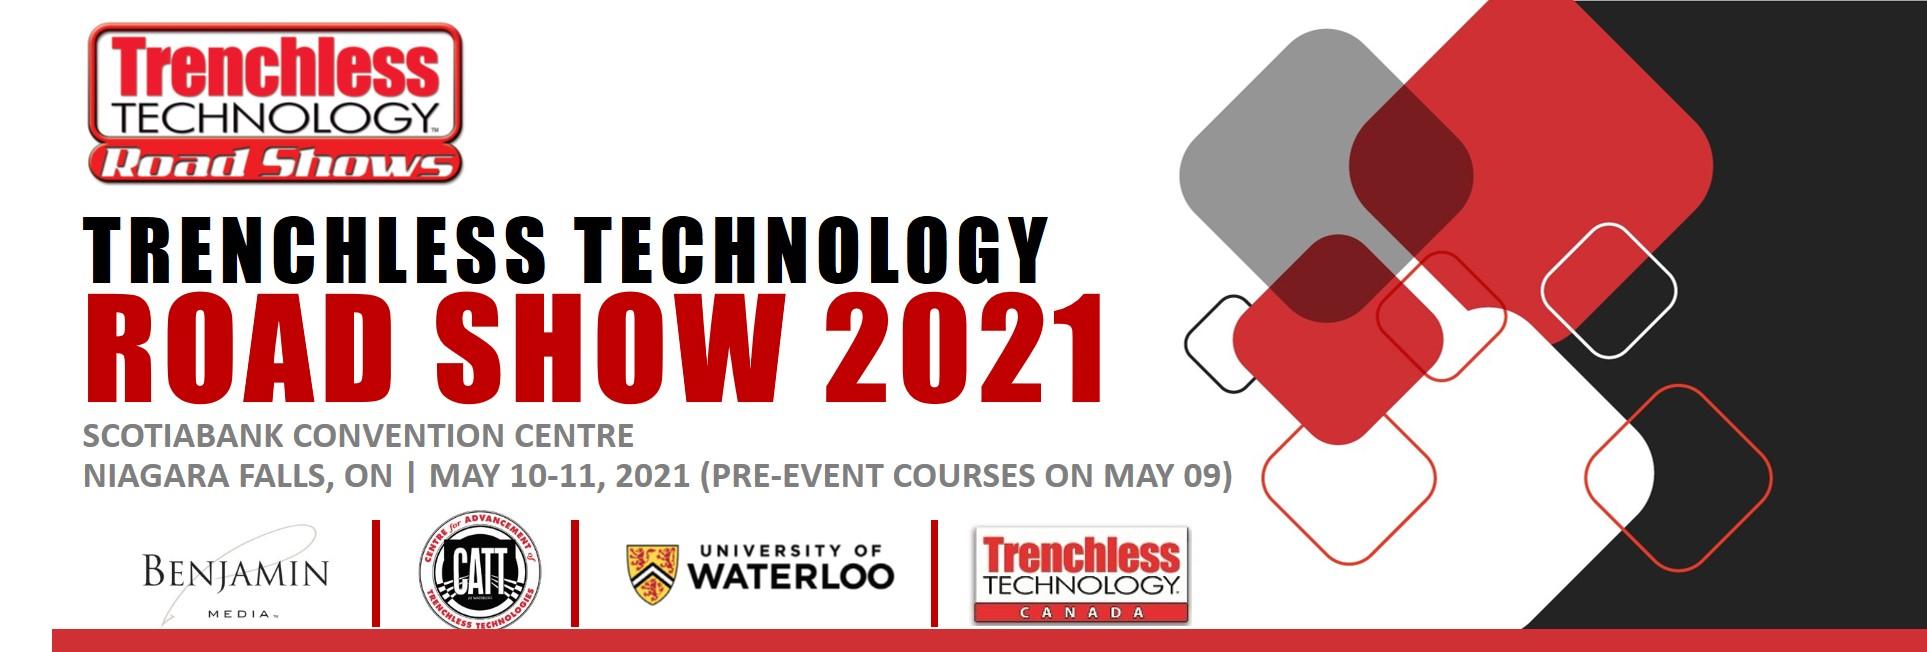 Trenchless Technology Roadshow Niagara Falls